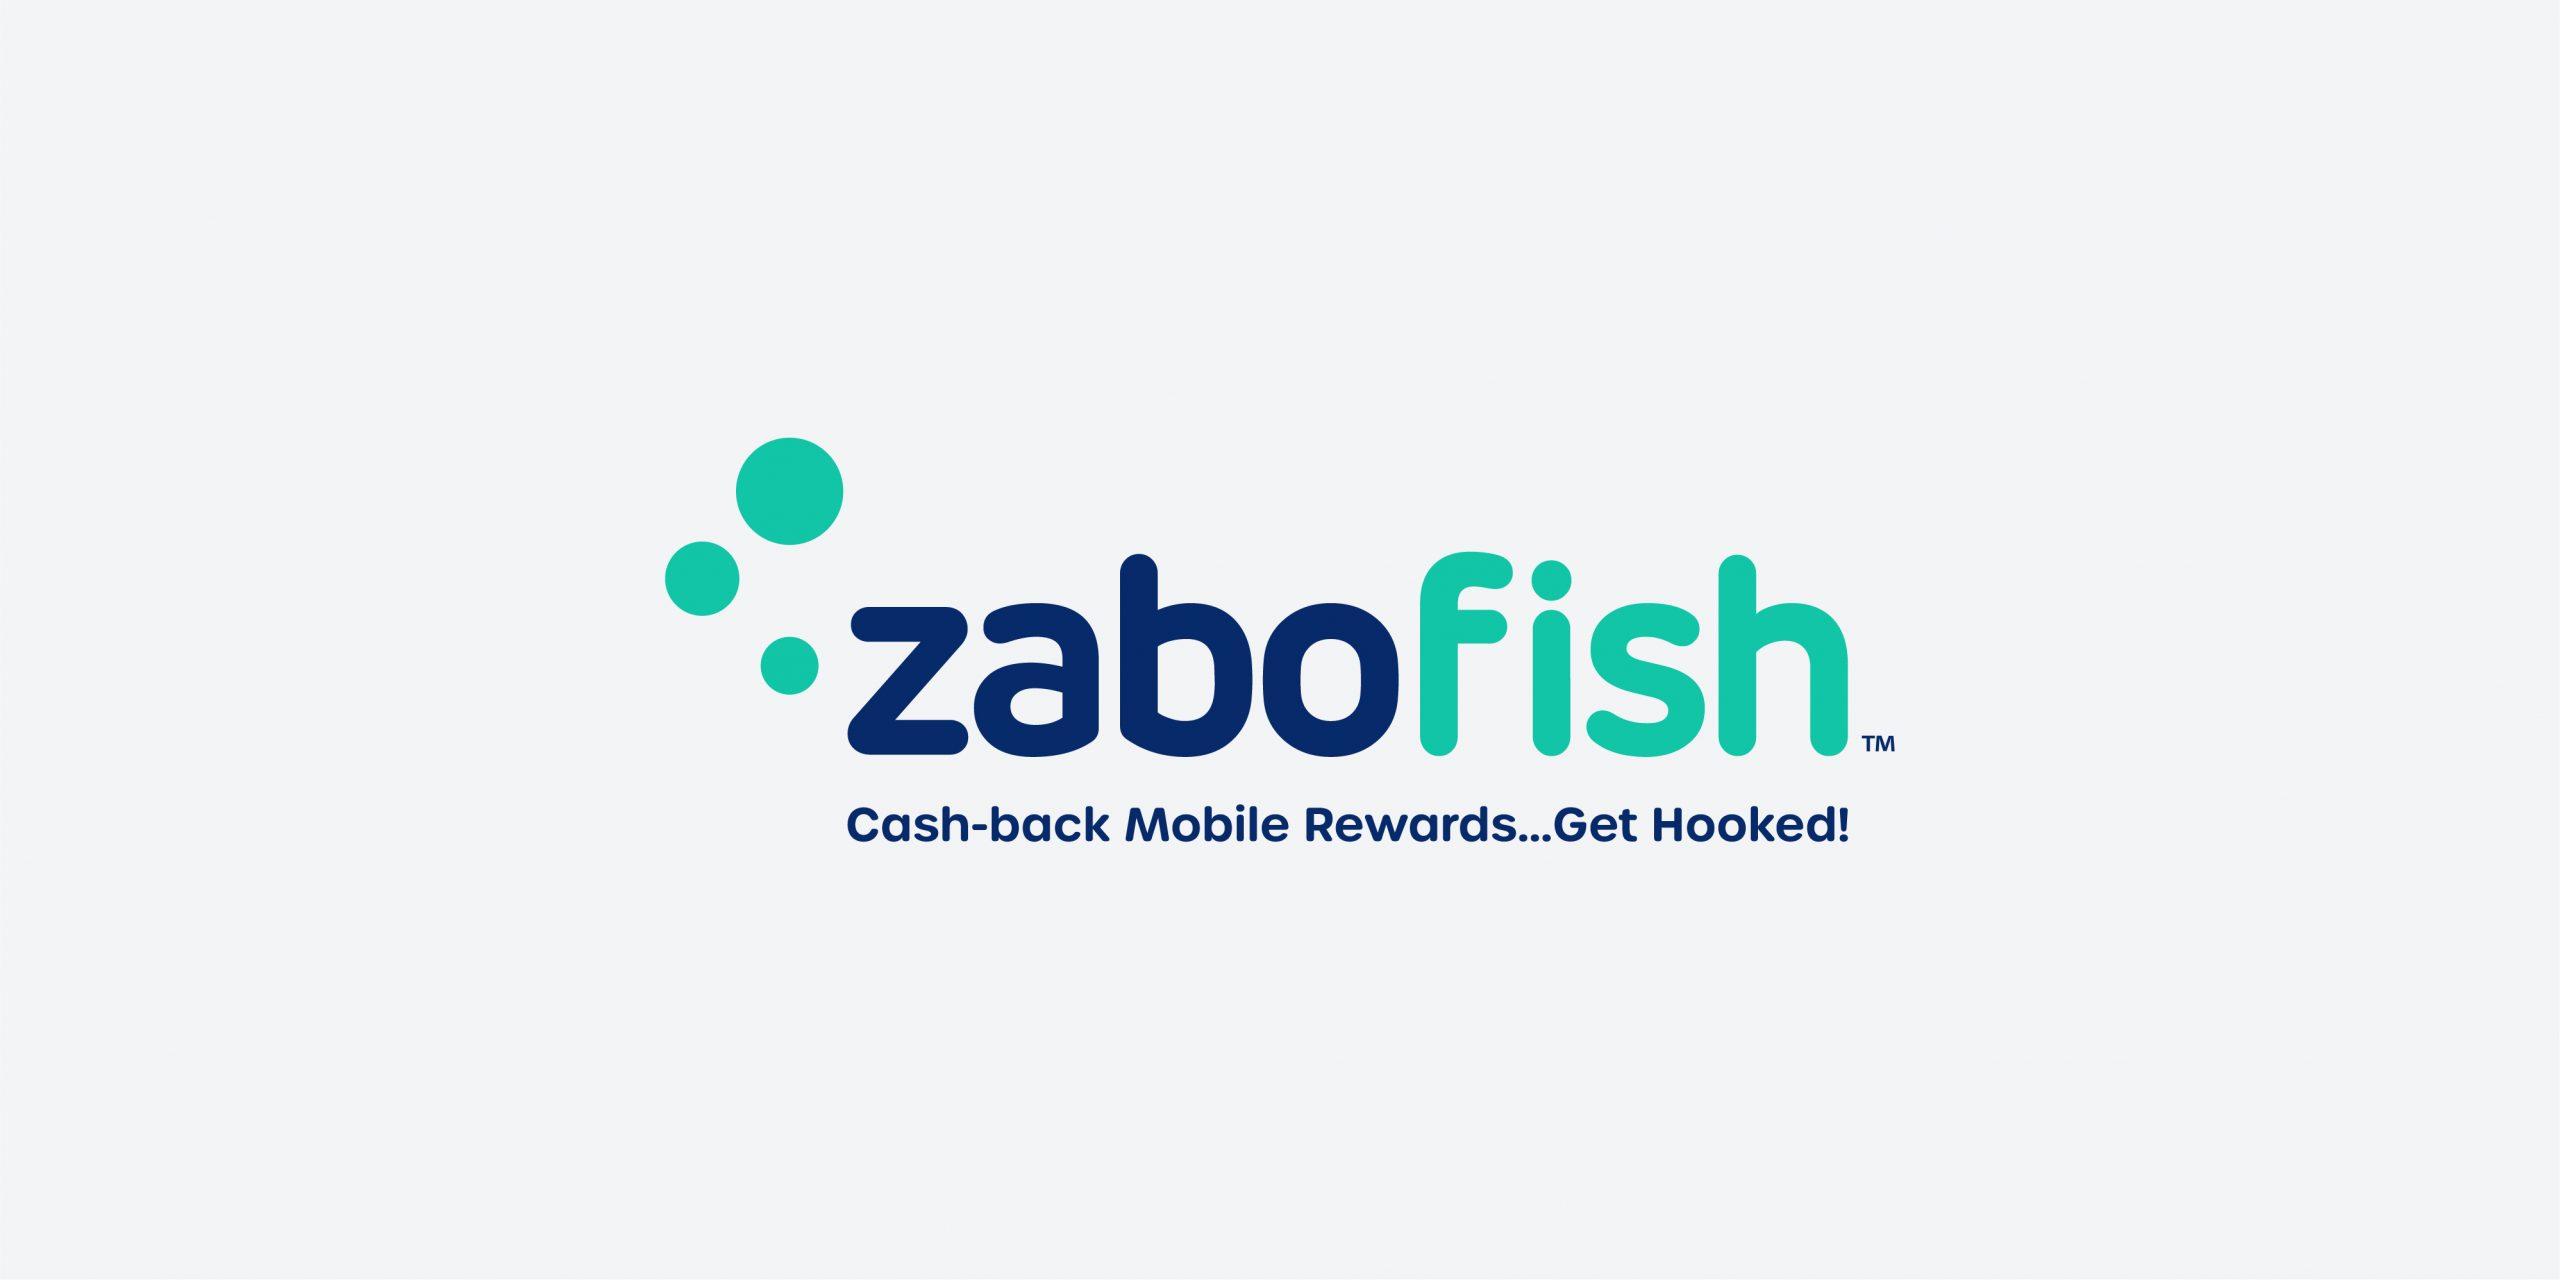 ZaboFish_Color_Tagline